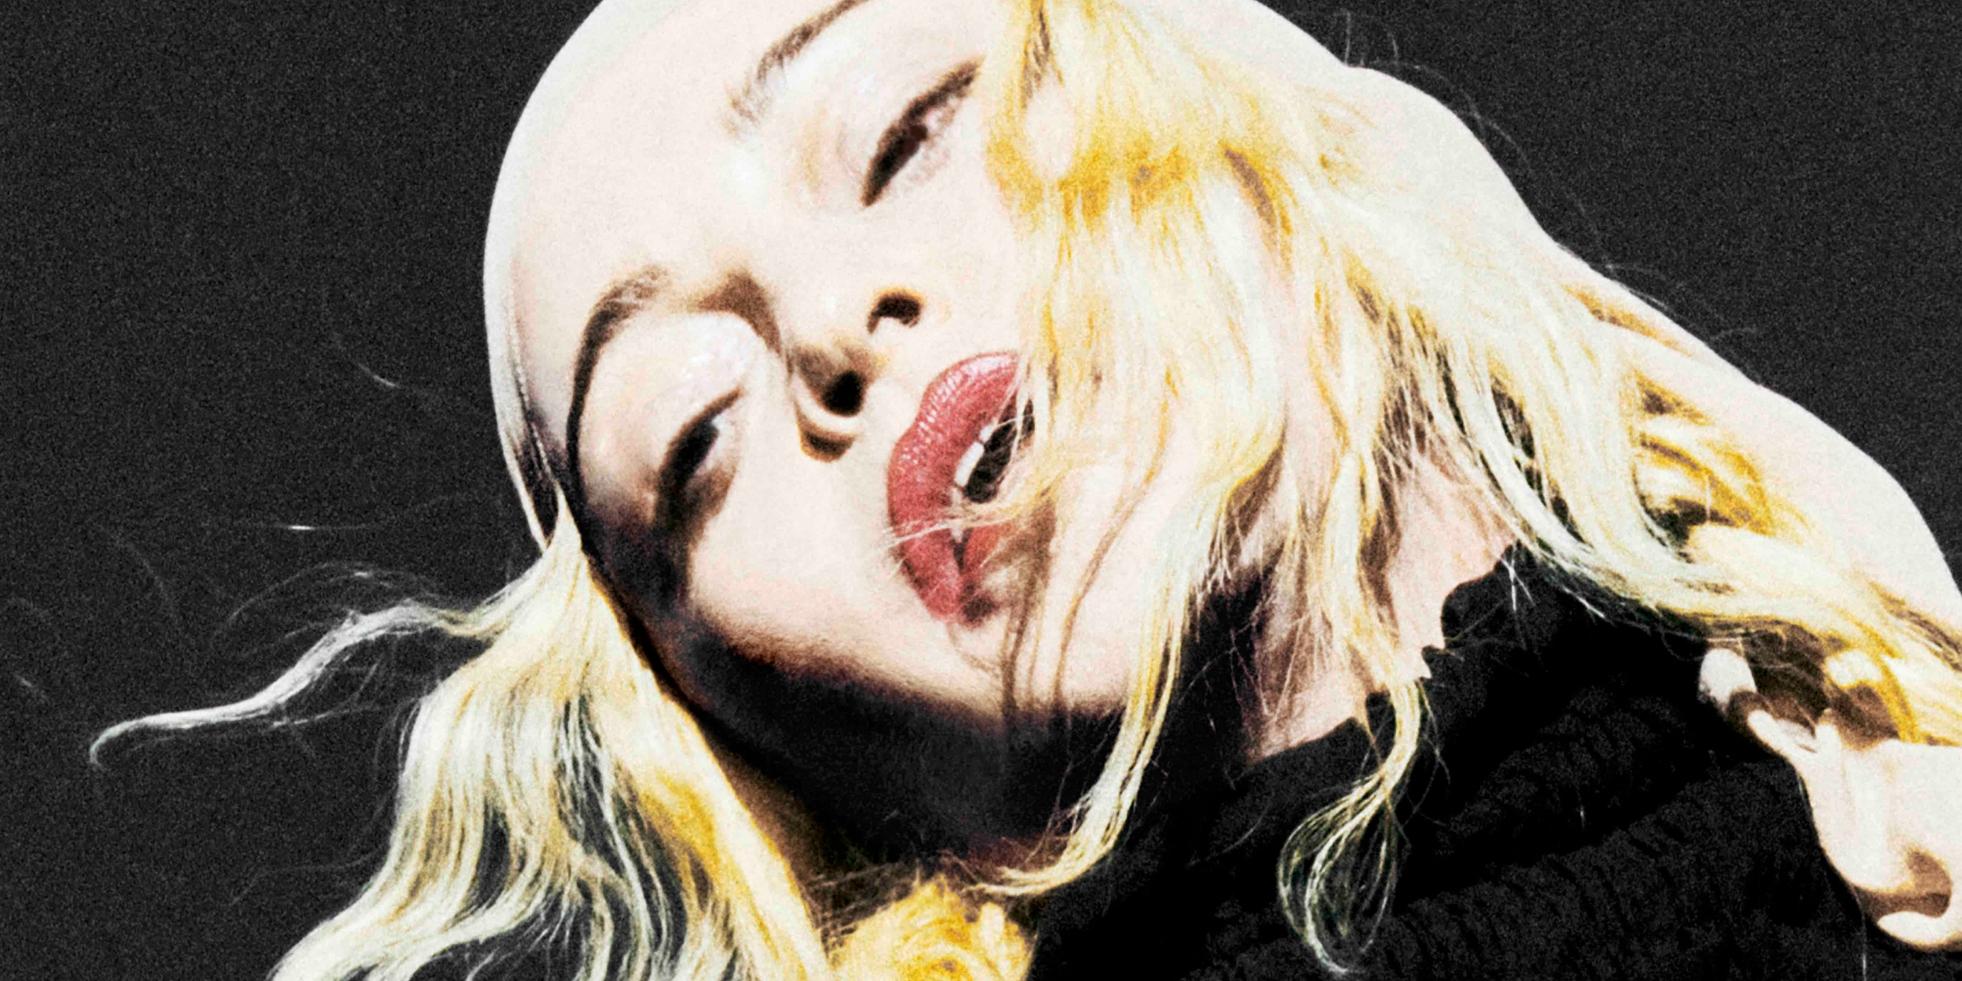 Albumism_Madonna_IRise_MainImage1.jpg